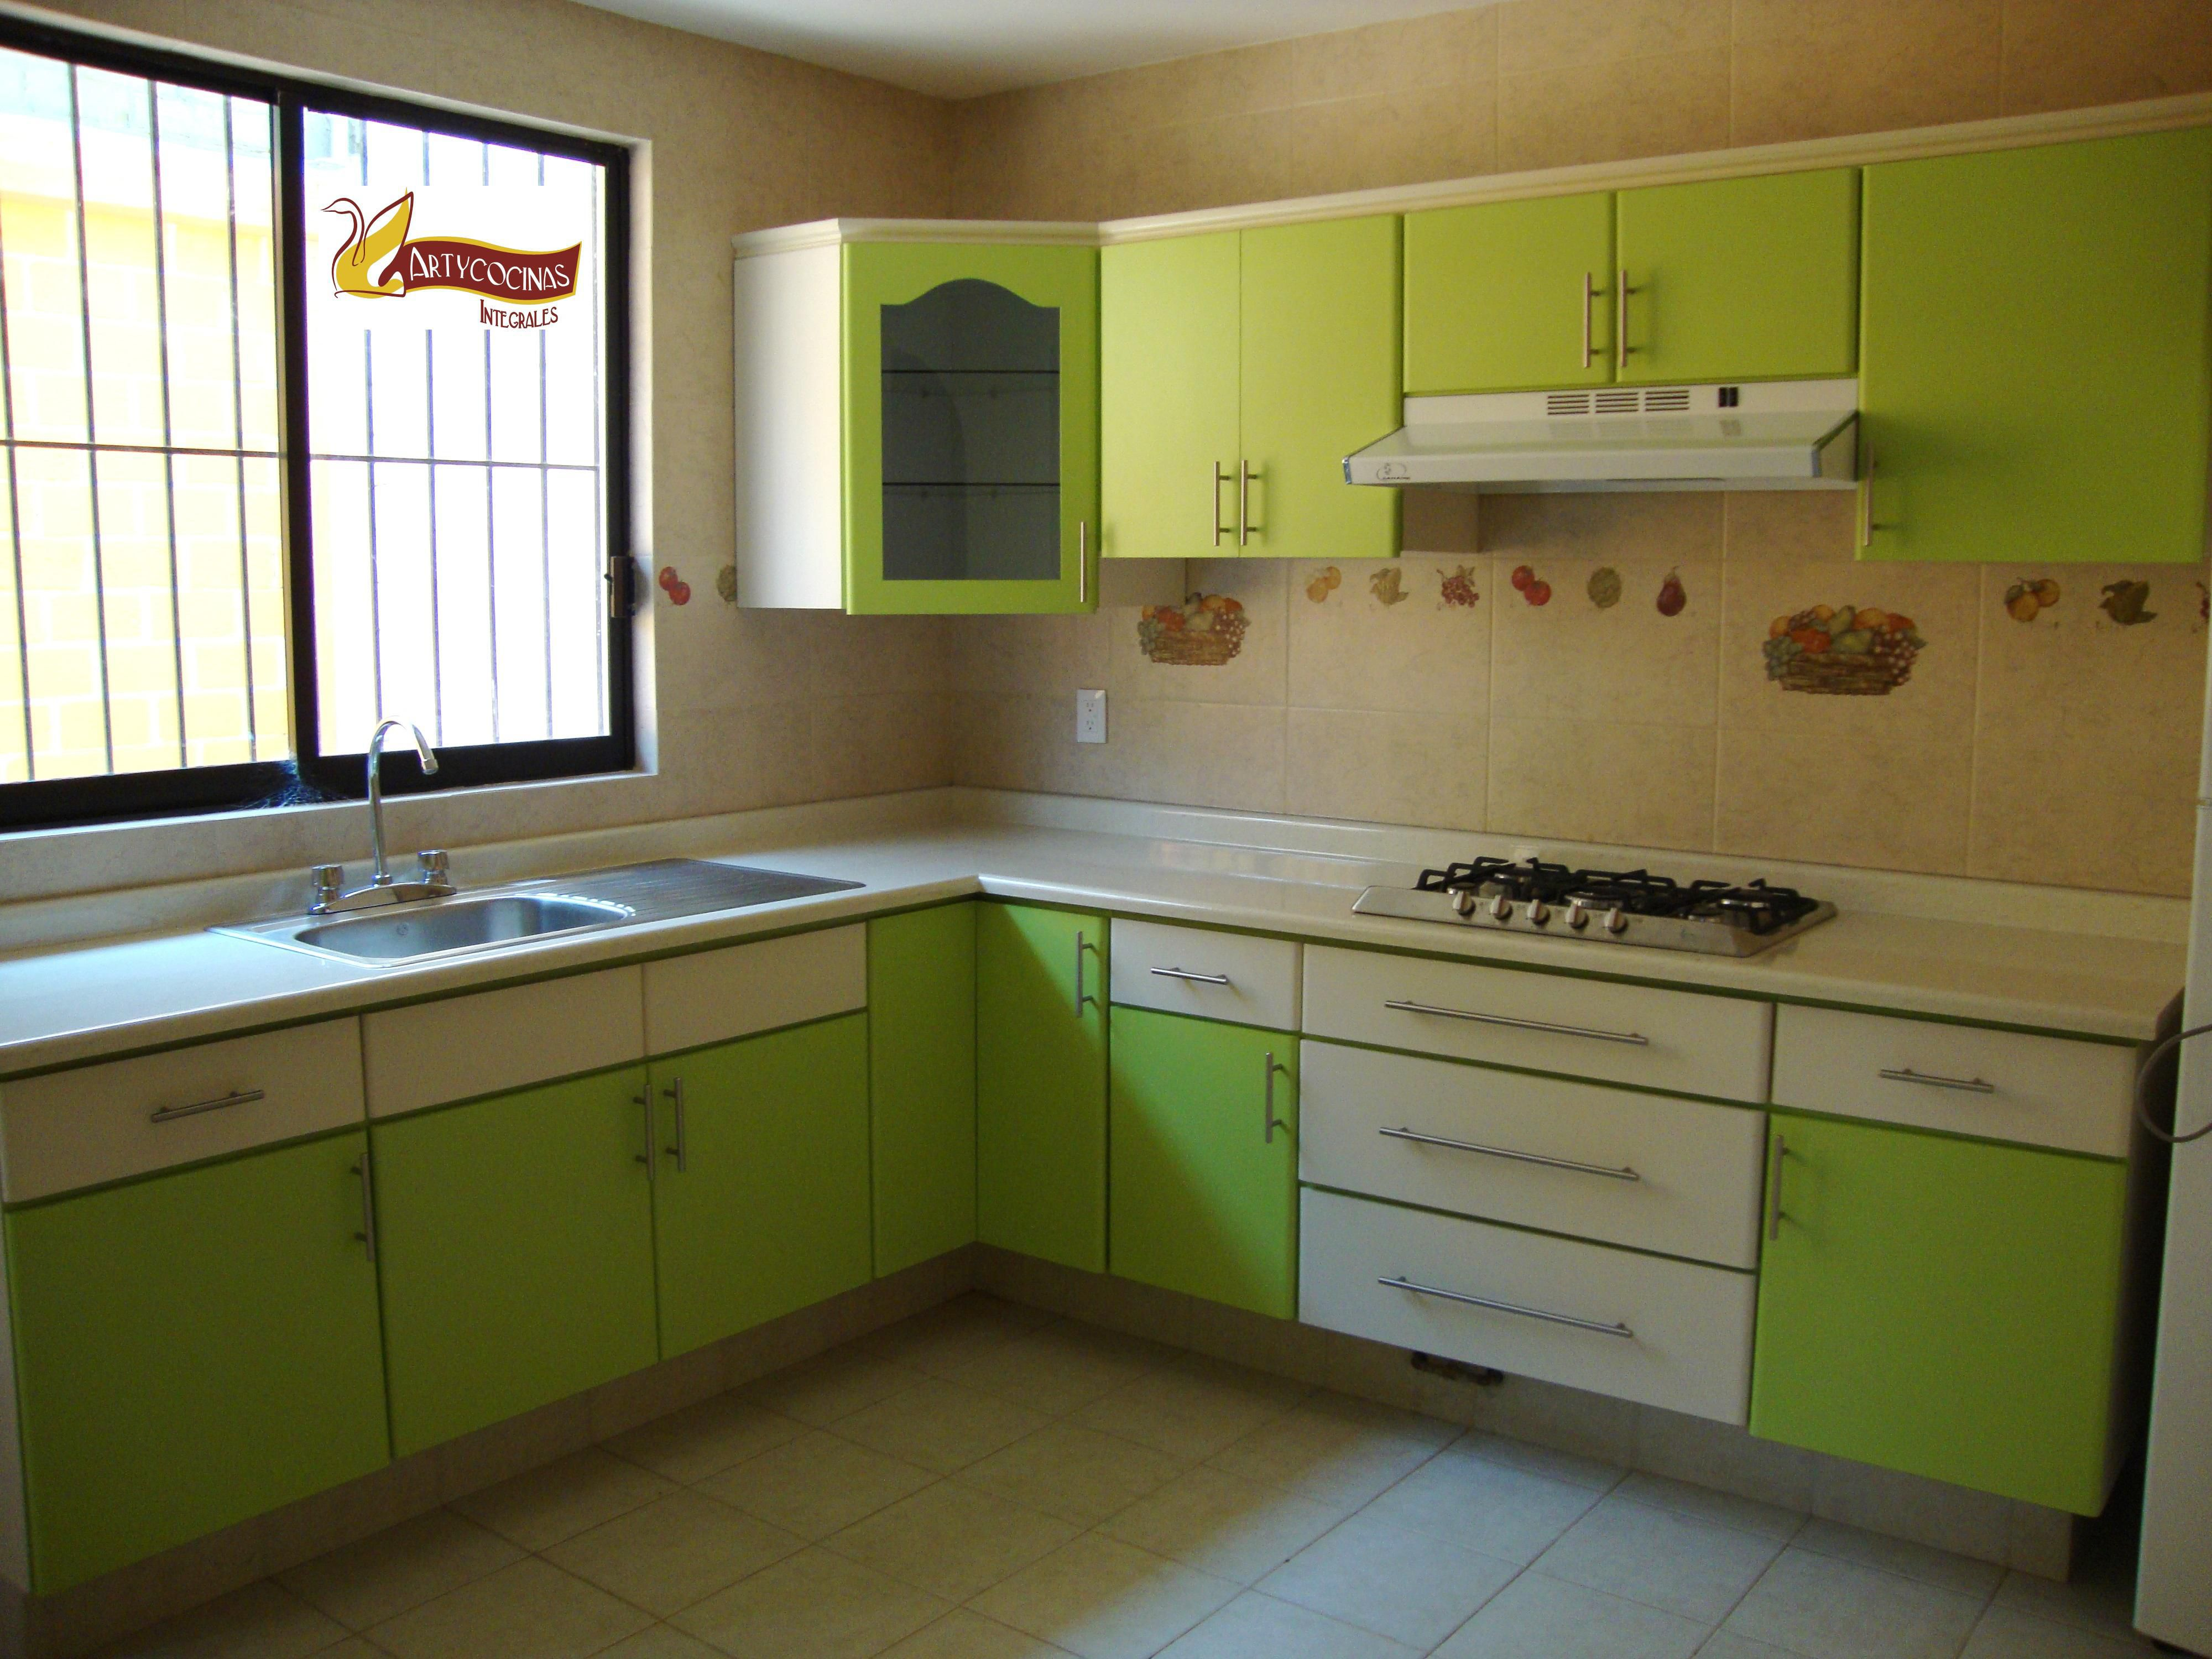 Muebles de cocina usados baratos ideas for Amazon muebles de cocina